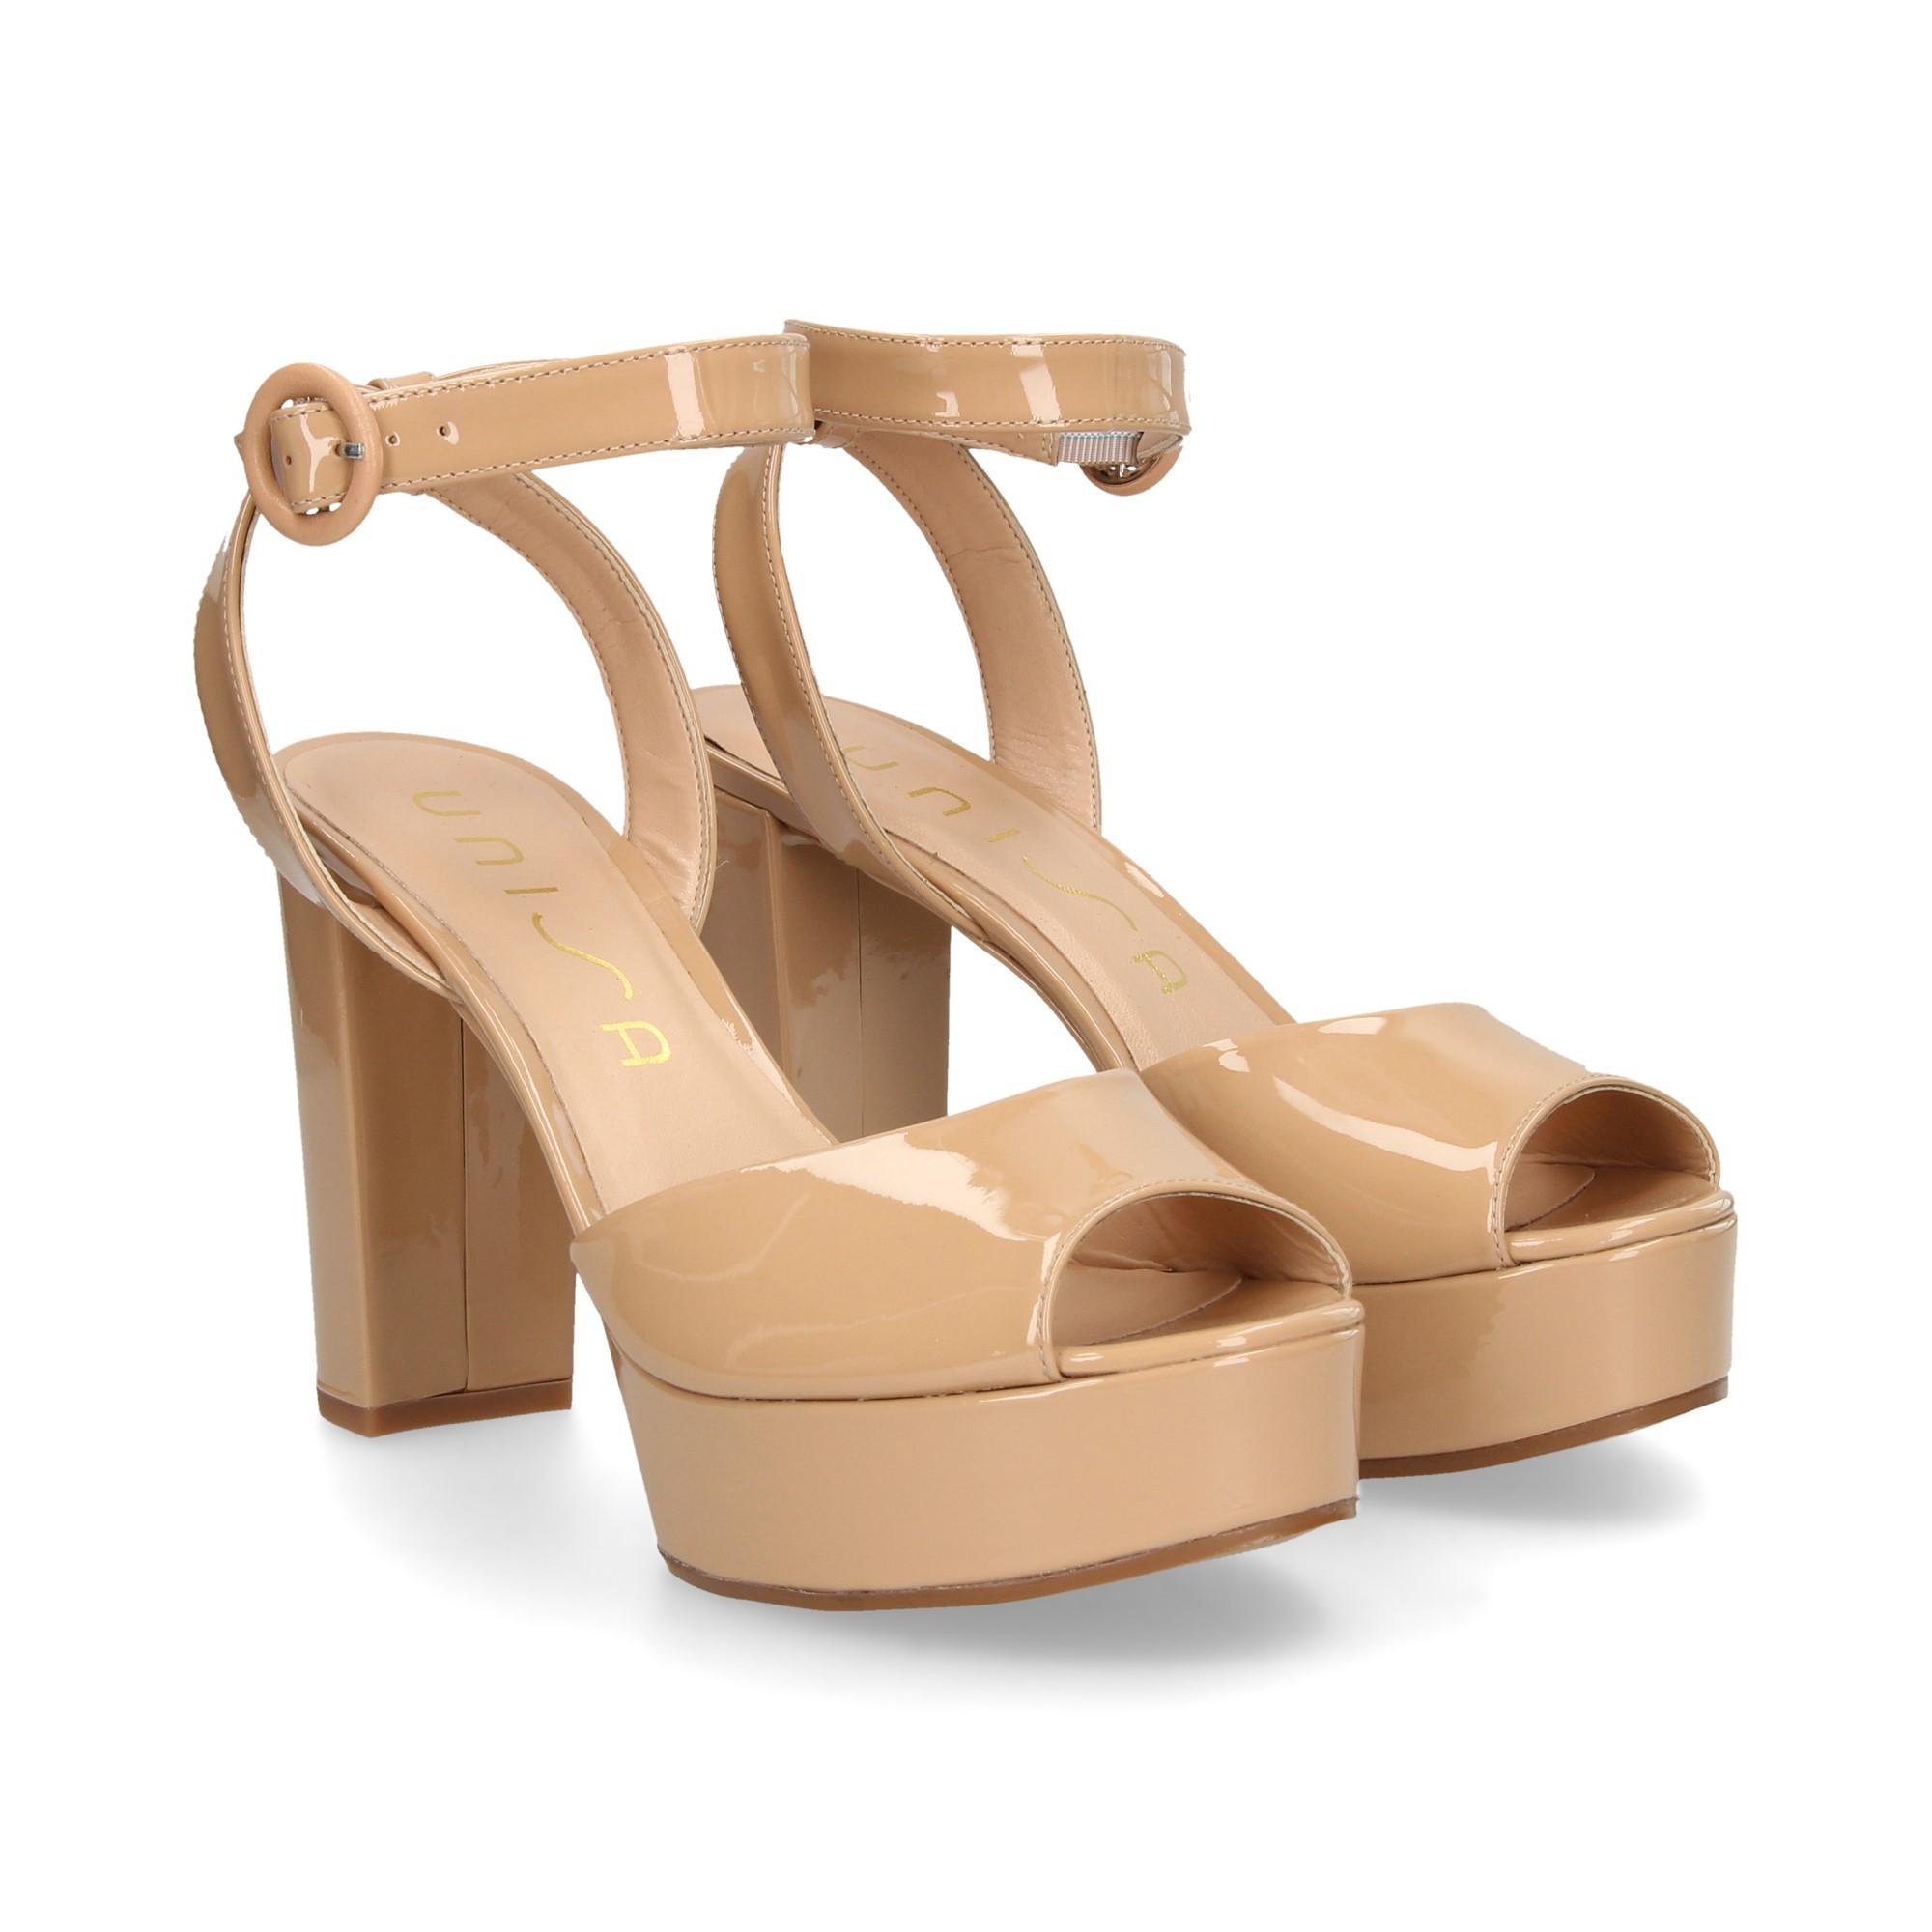 439086a662e UNISA Women s wedge sandals VENTA PA SUNTAN